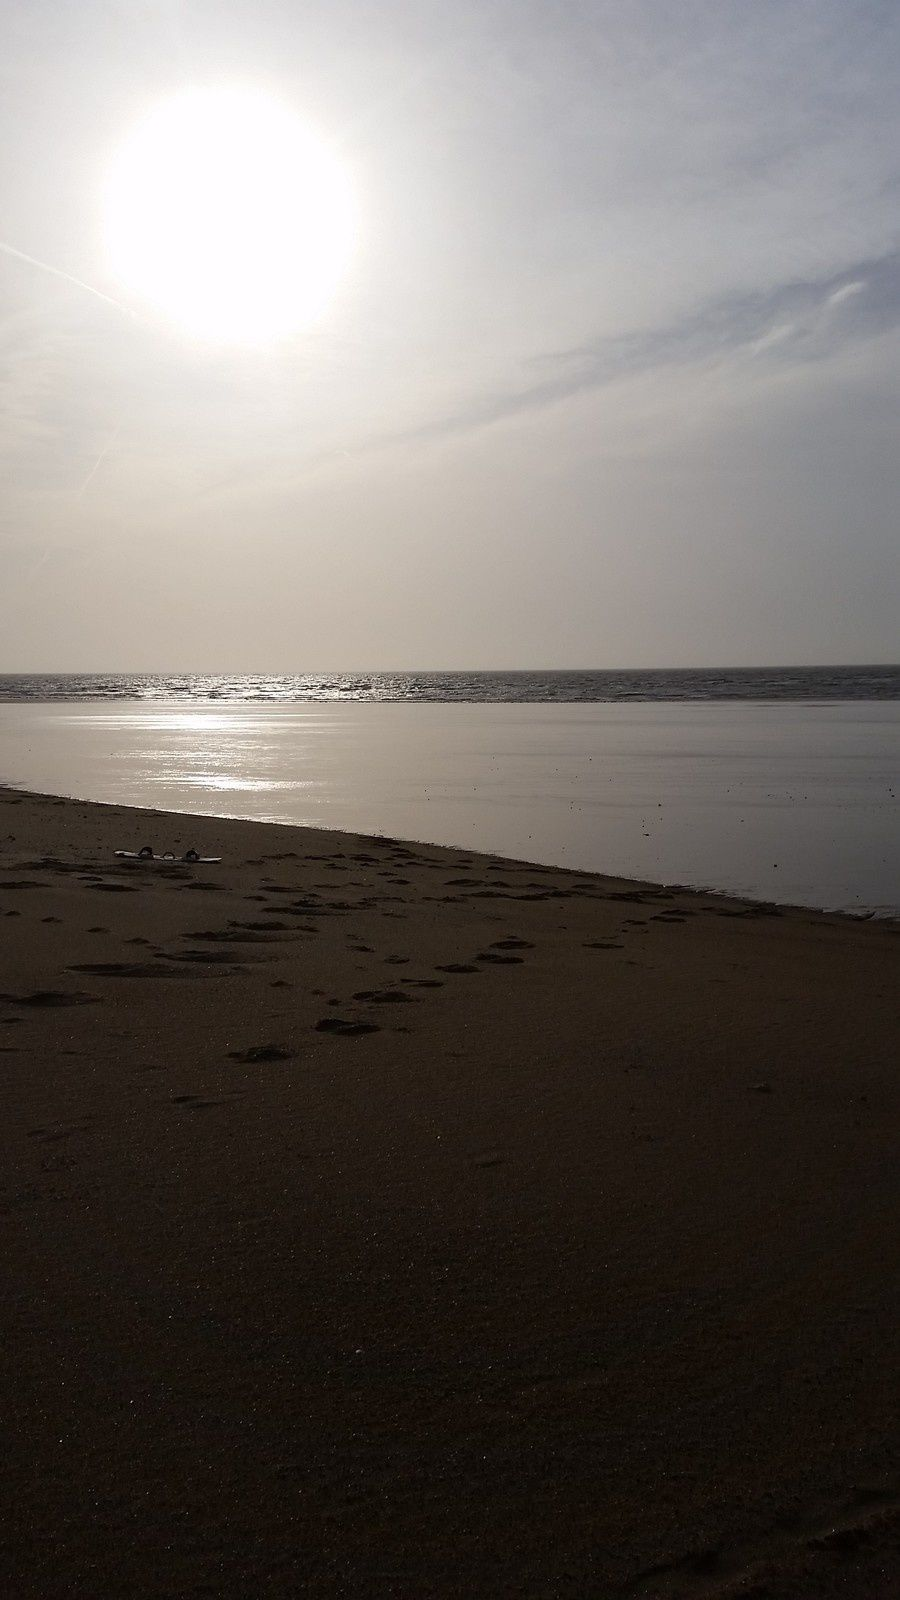 océan marée basse